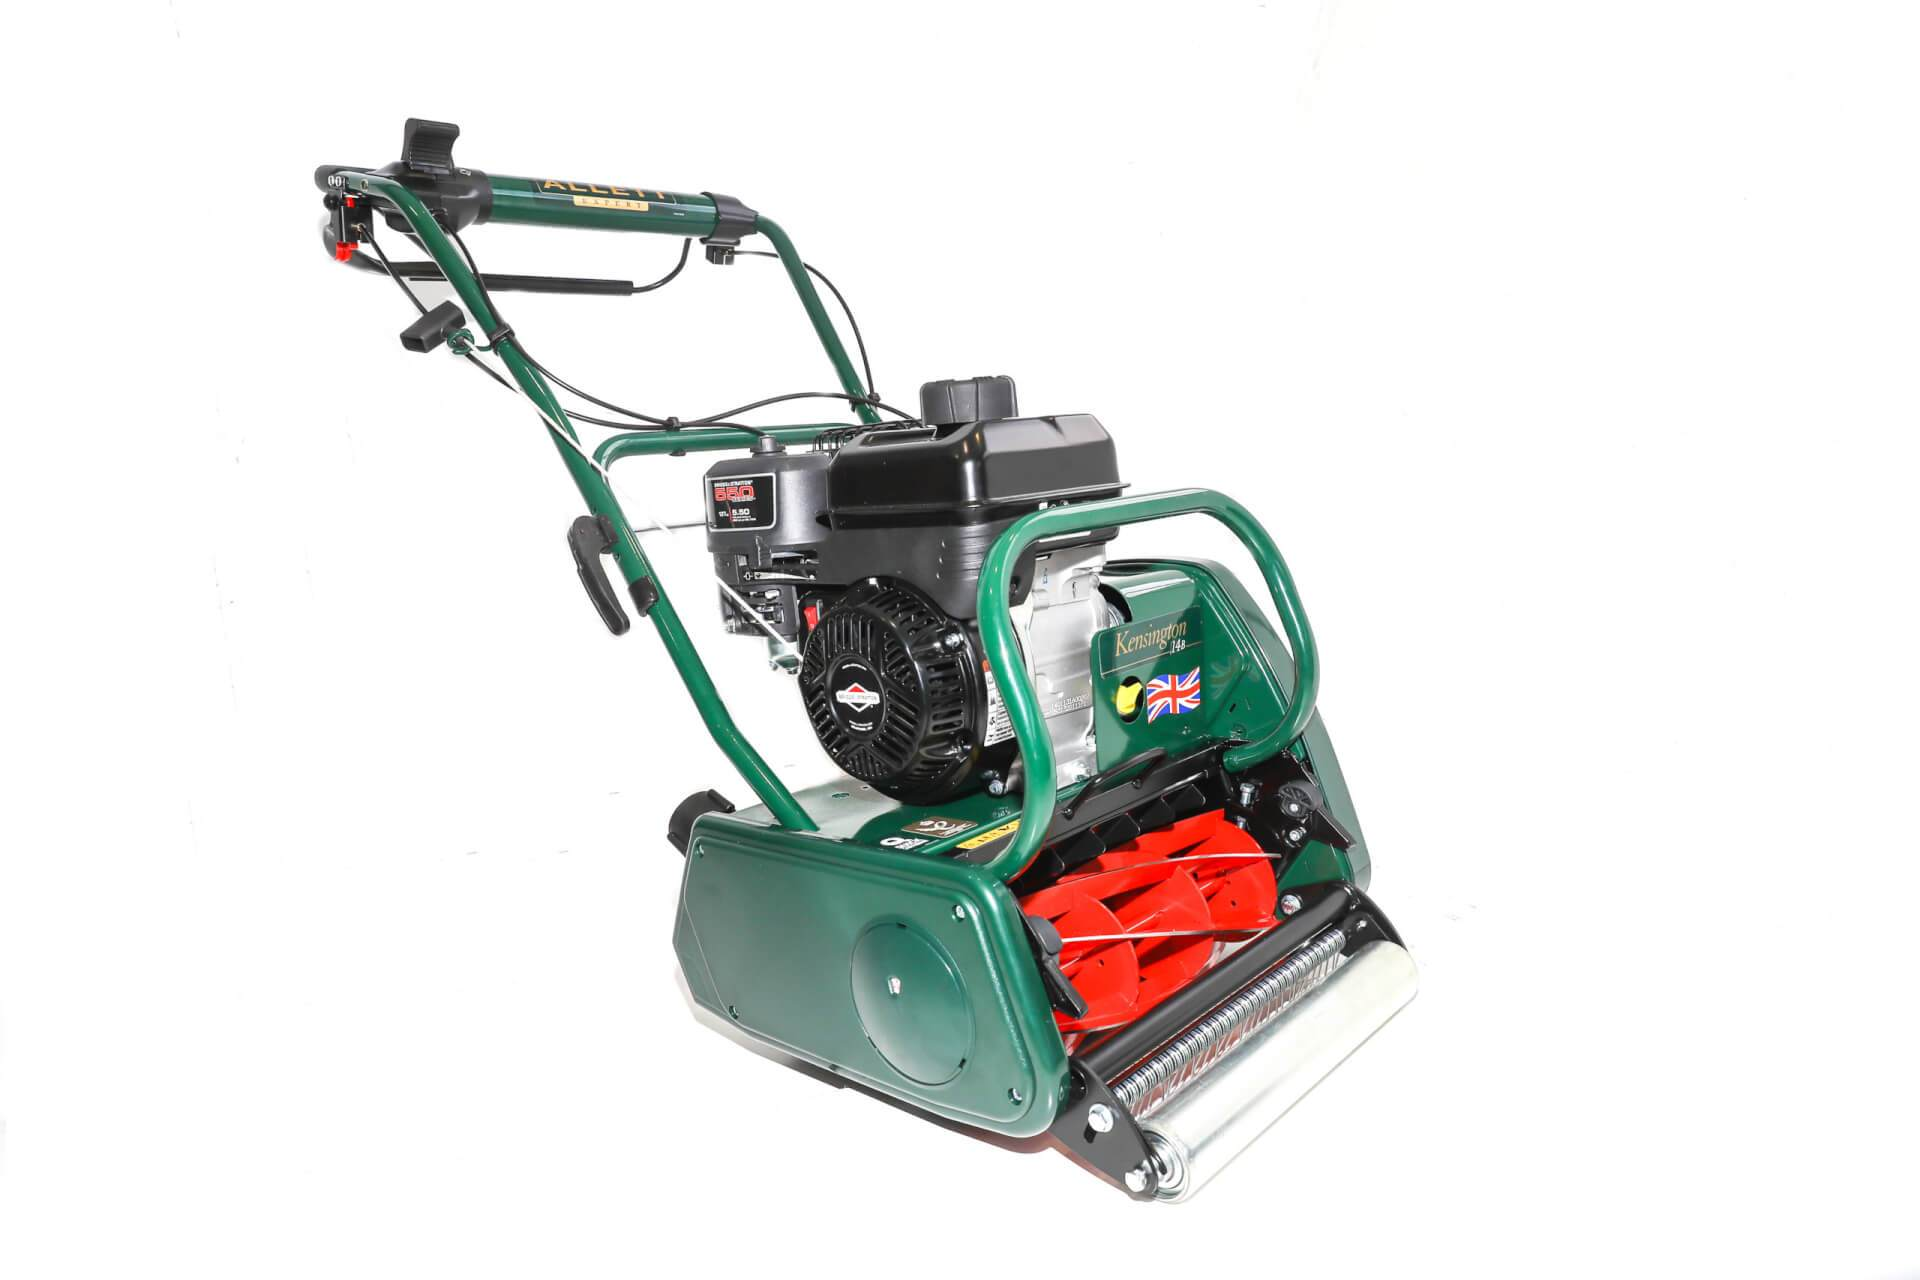 Allett Kensington 14B Petrol Cylinder Mower | Plymouth Garden Machinery